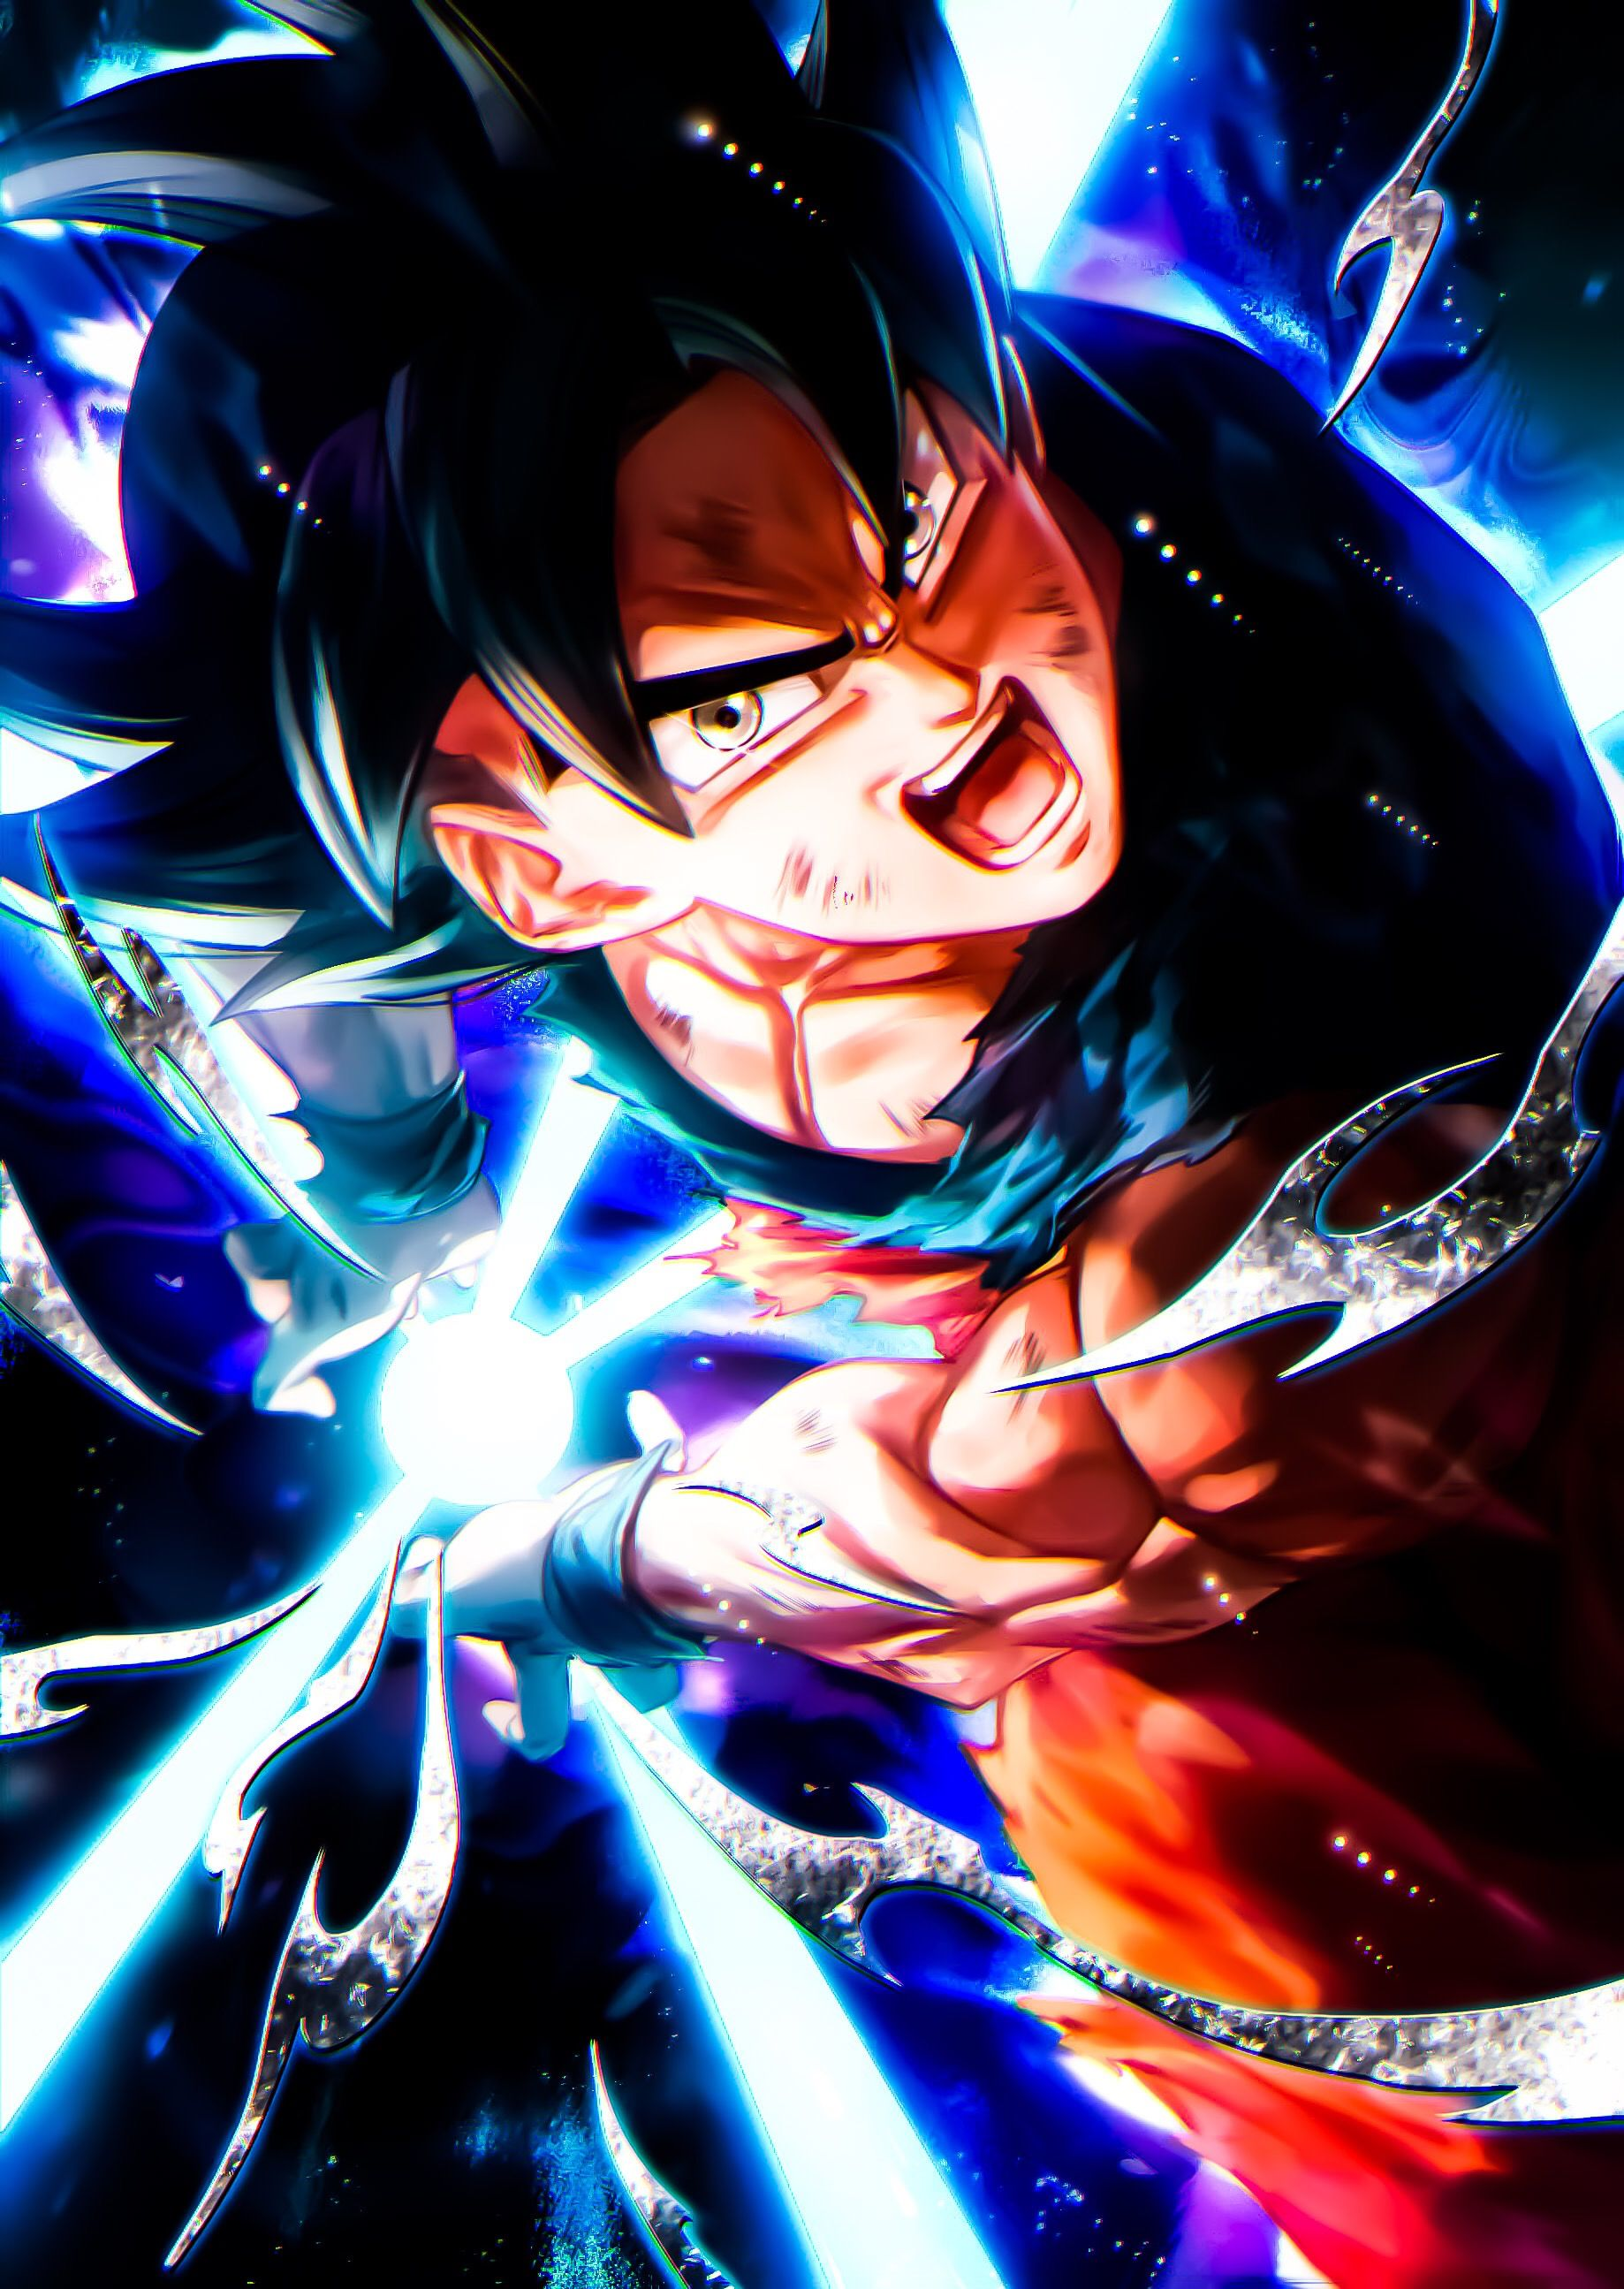 Ultra Instinct Sign Kame Hame Haaa Anime Dragon Ball Super Dragon Ball Artwork Anime Dragon Ball